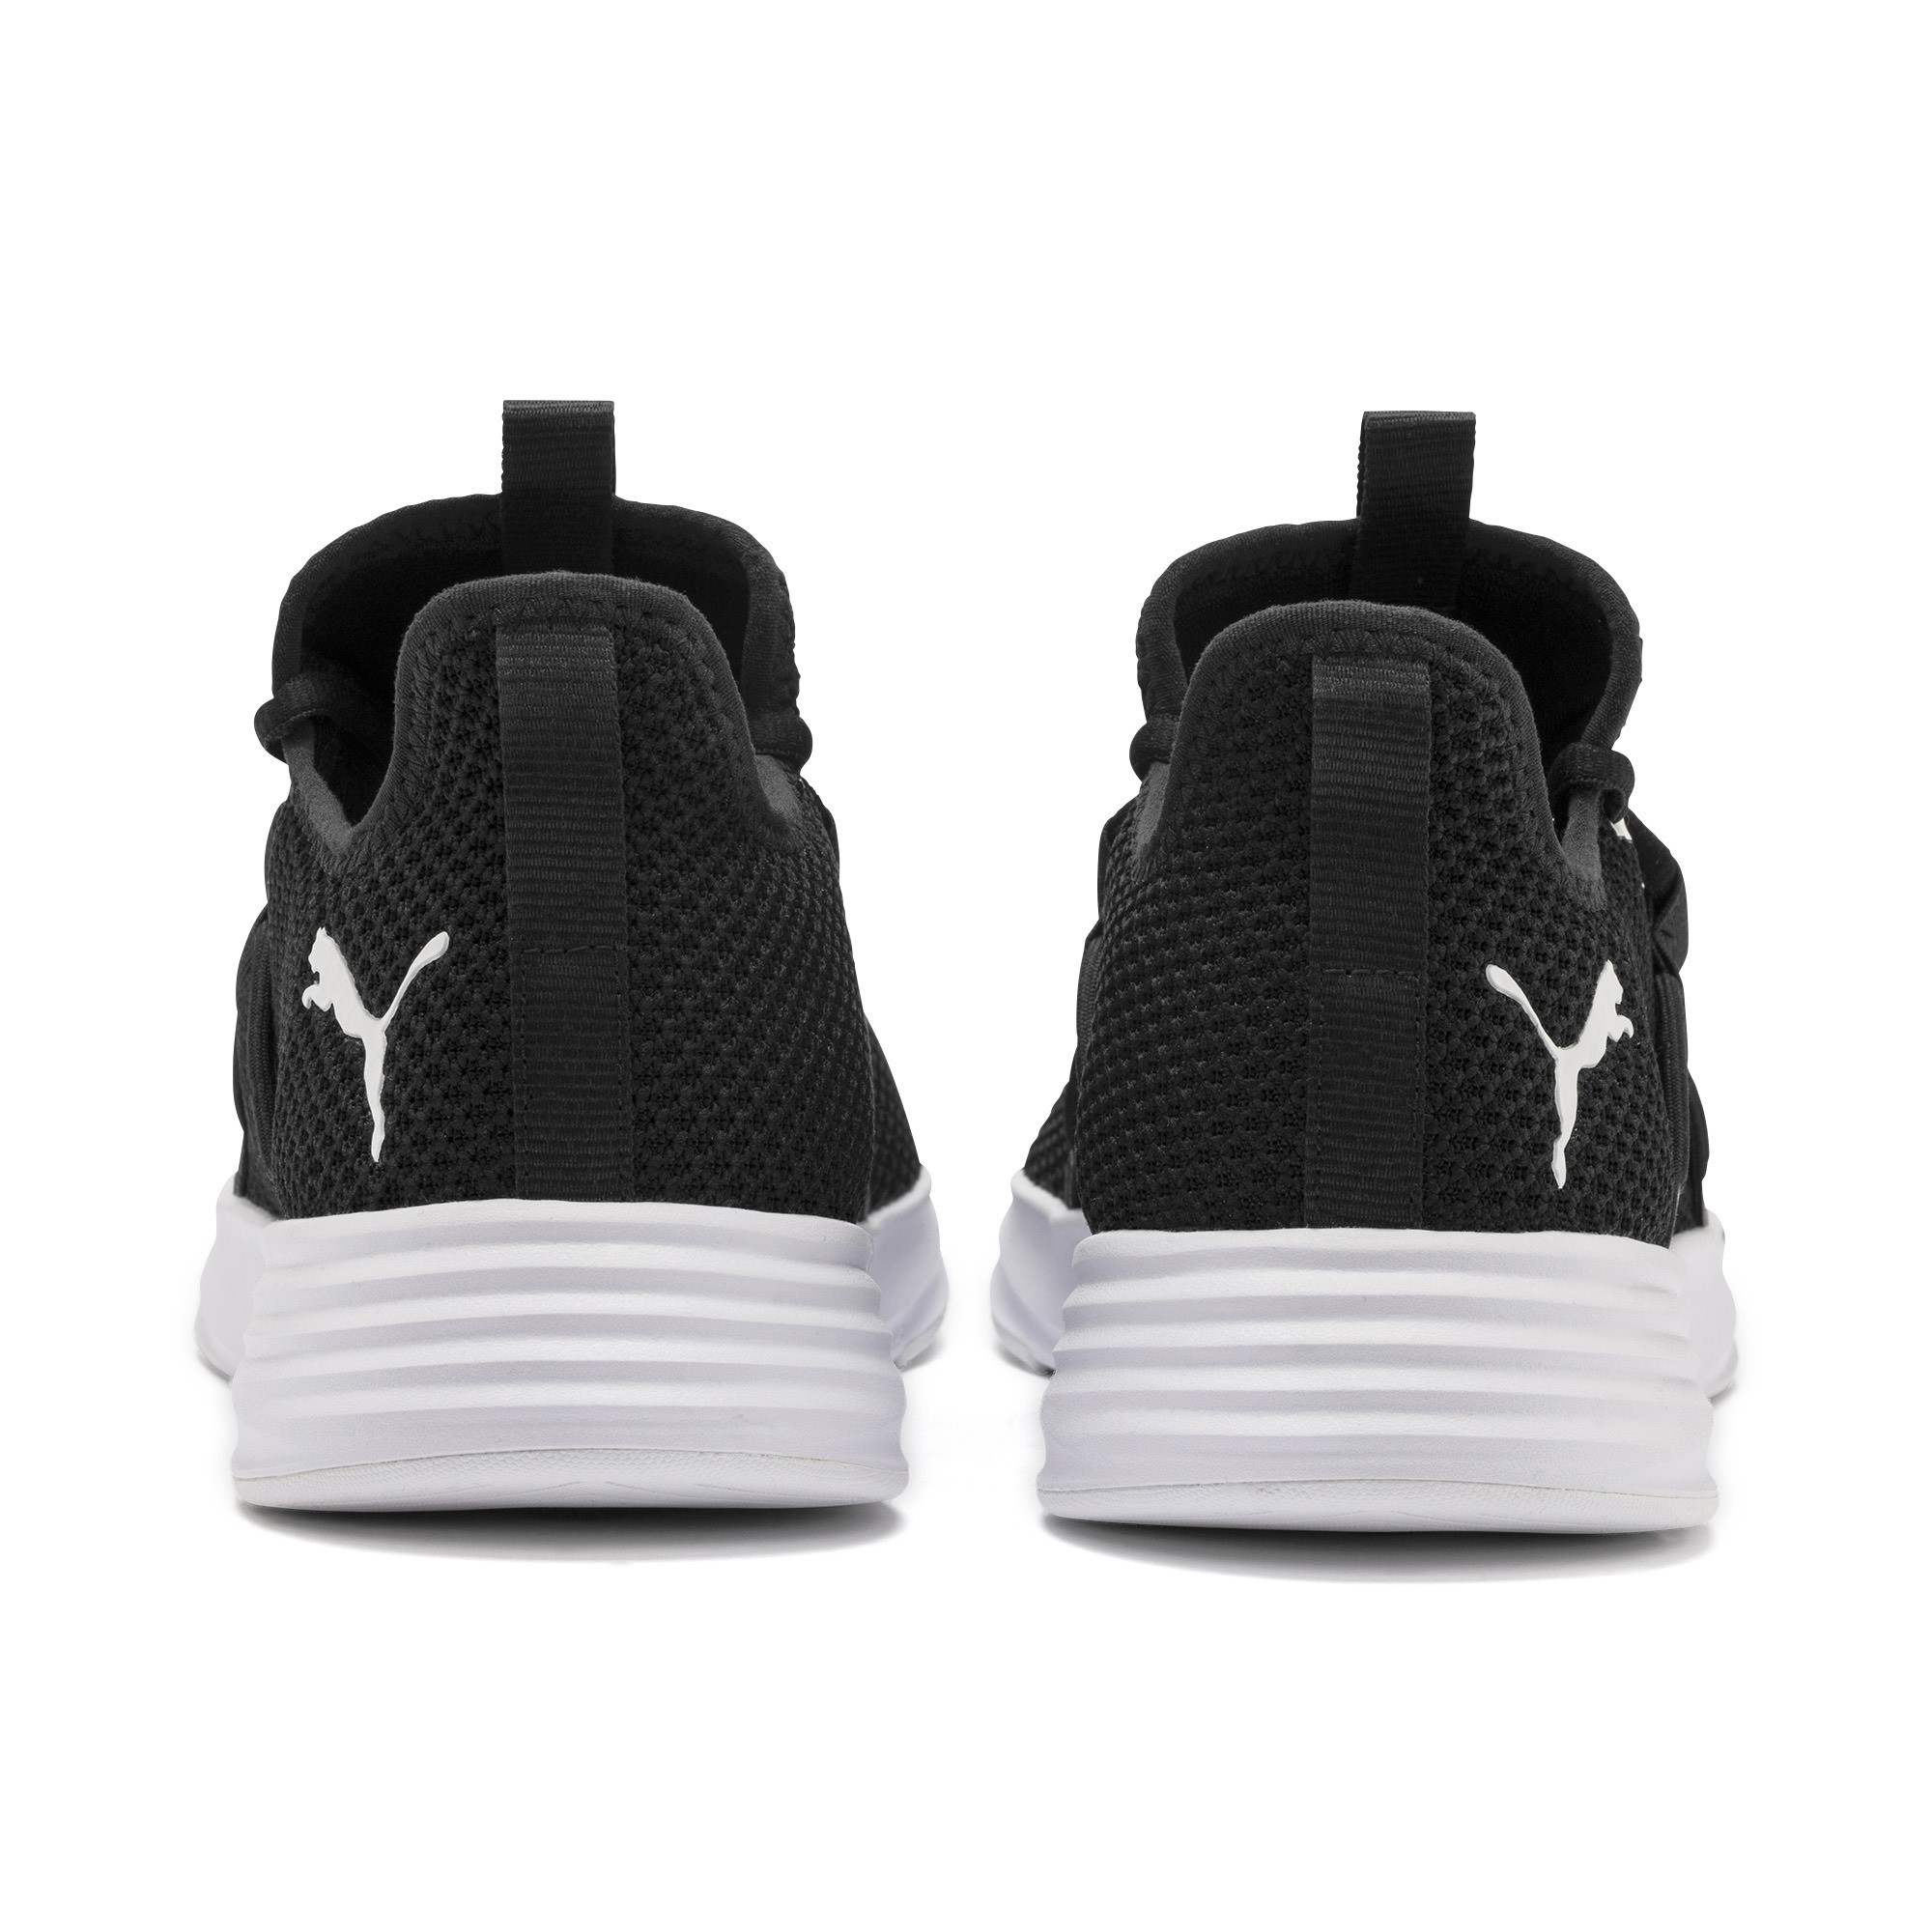 PUMA-Men-039-s-Persist-XT-Knit-Training-Shoes thumbnail 3